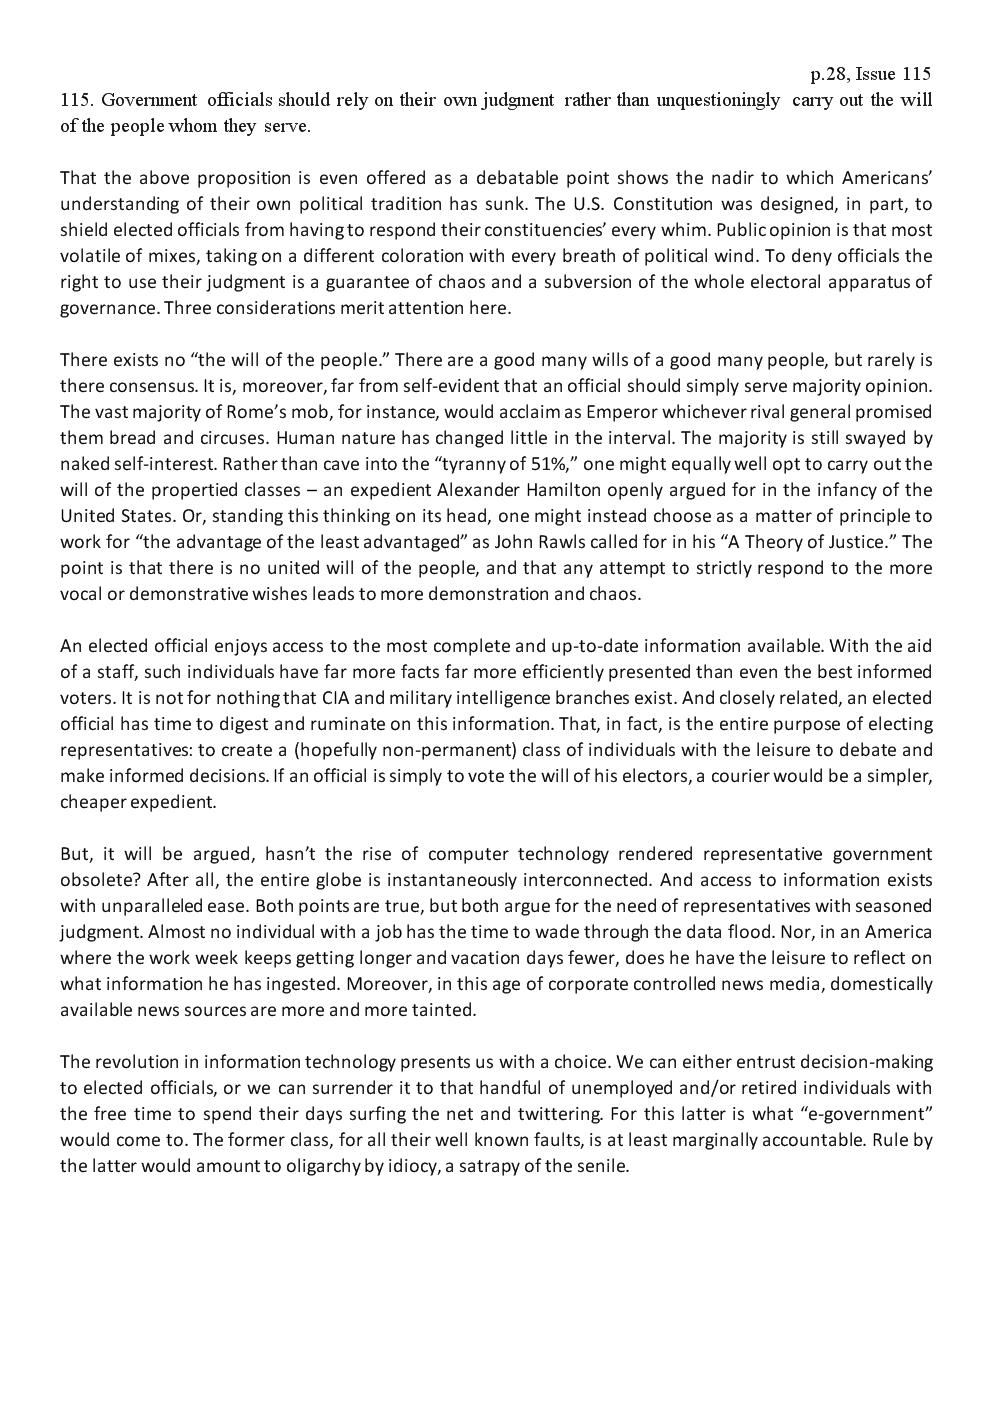 Issue115gov'swillx英语四六级雅思托福考研GRE高考GMAT大小作文宝典策略技巧范文模板.doc